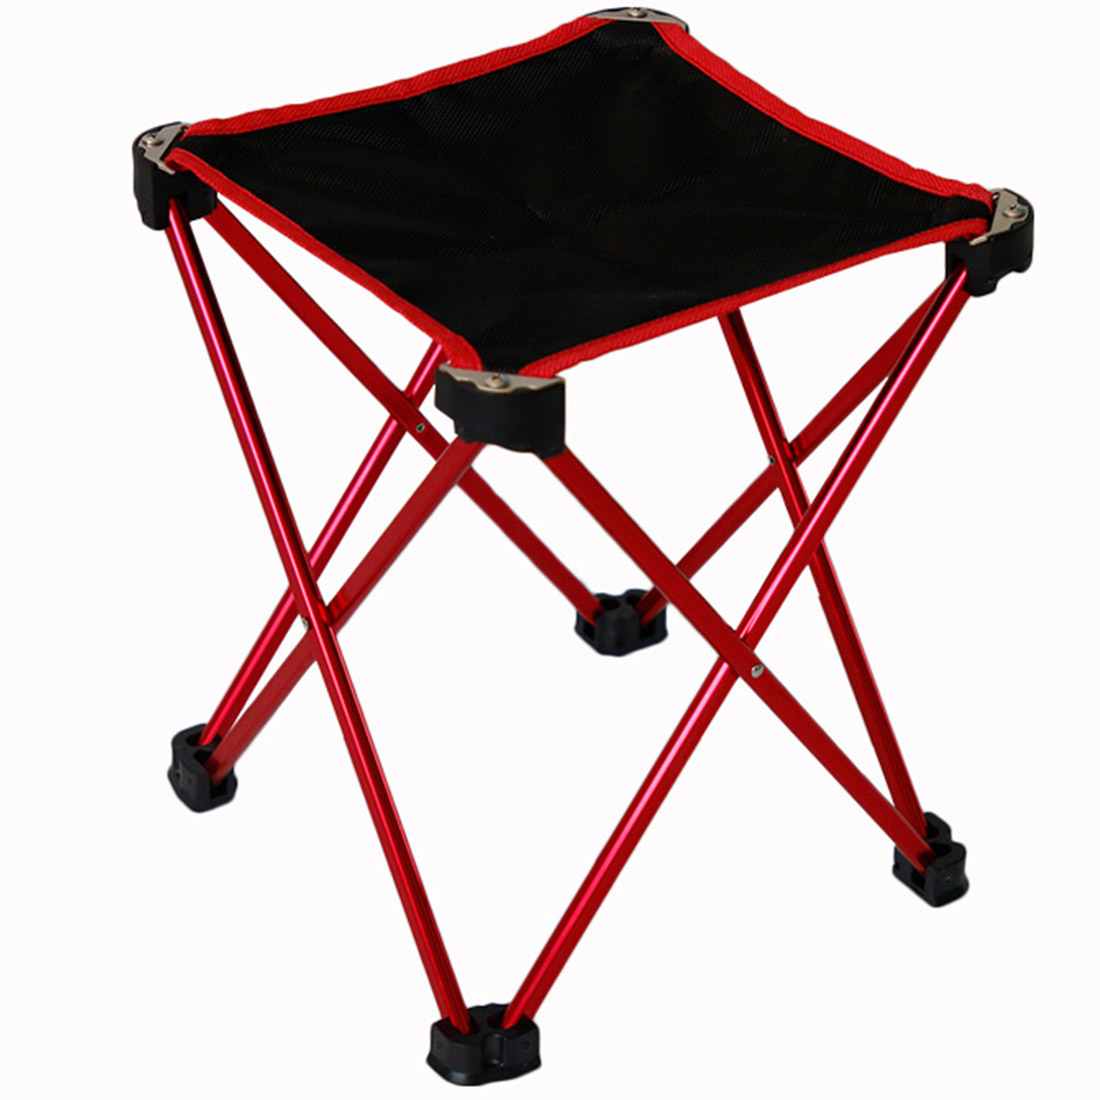 Outdoor Portable Folding Camping Chair Light Fishing Beach